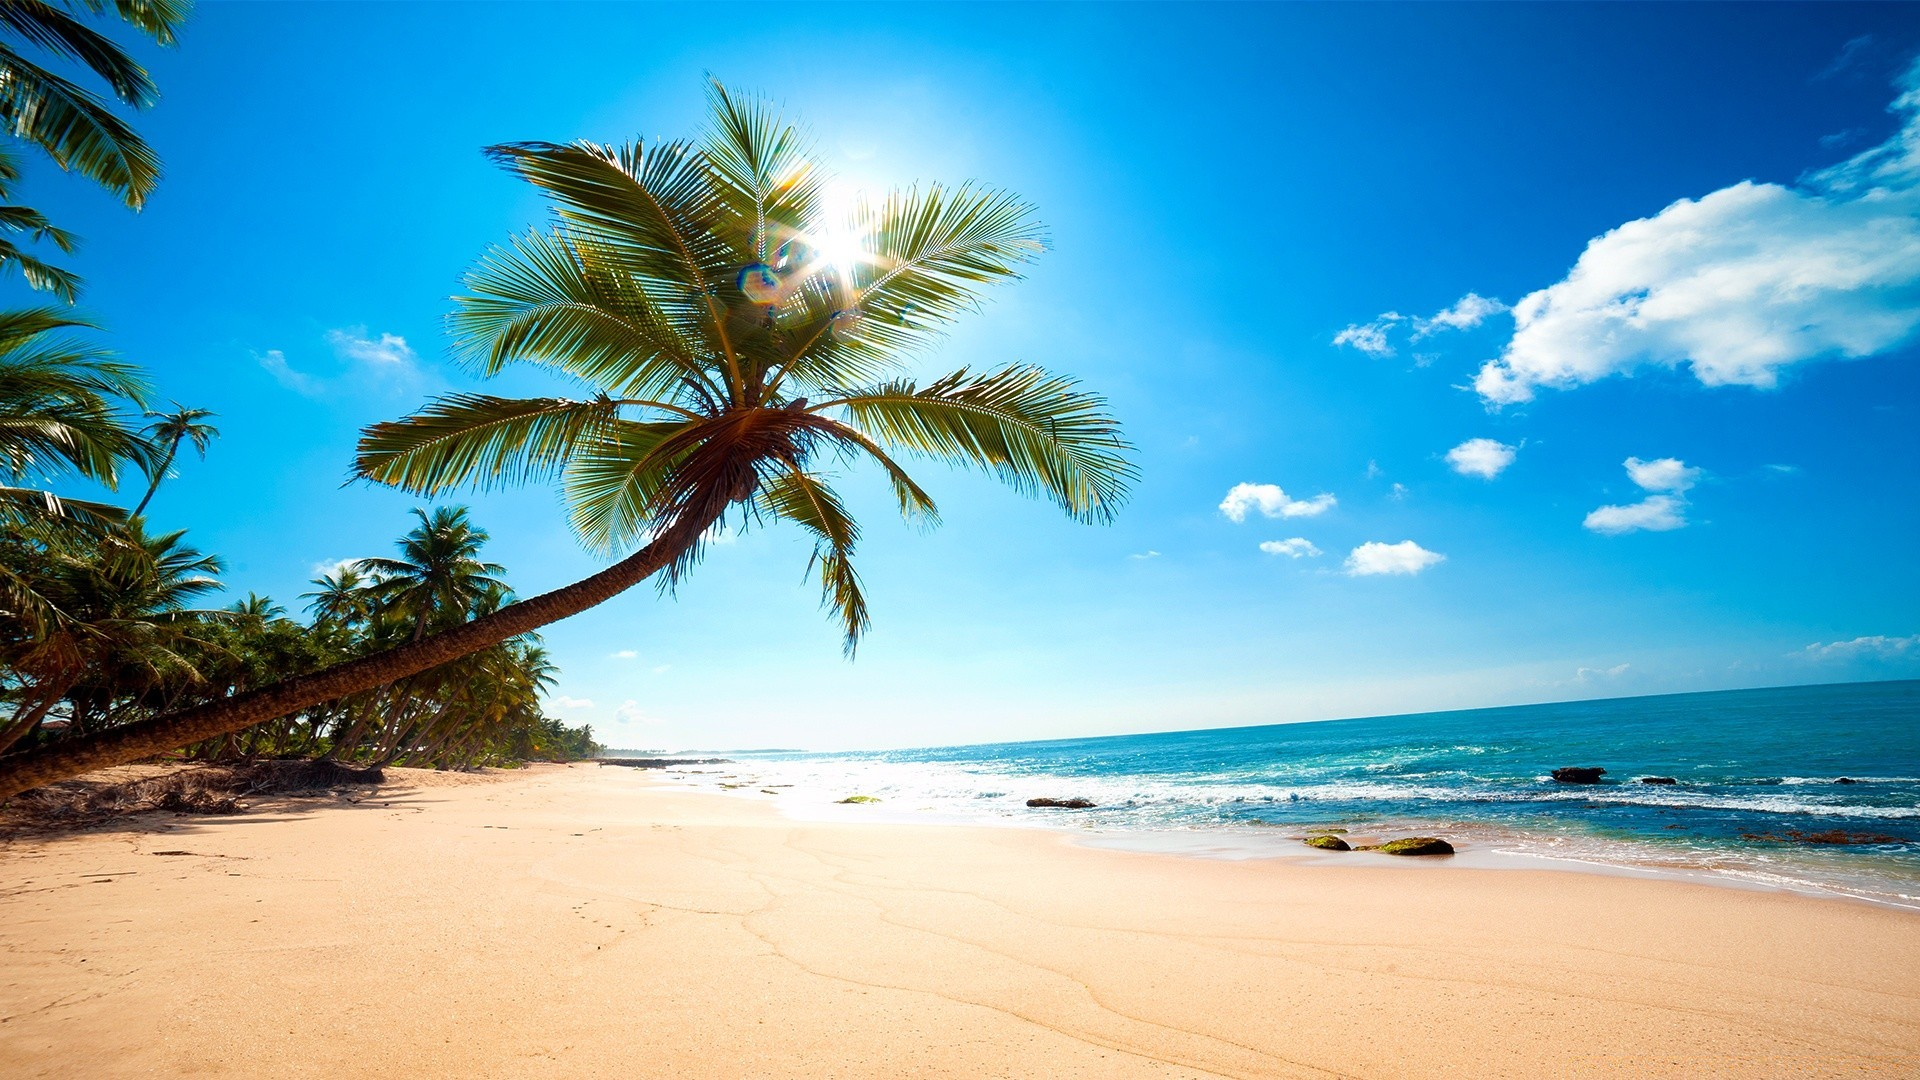 Картинки пляжа обои